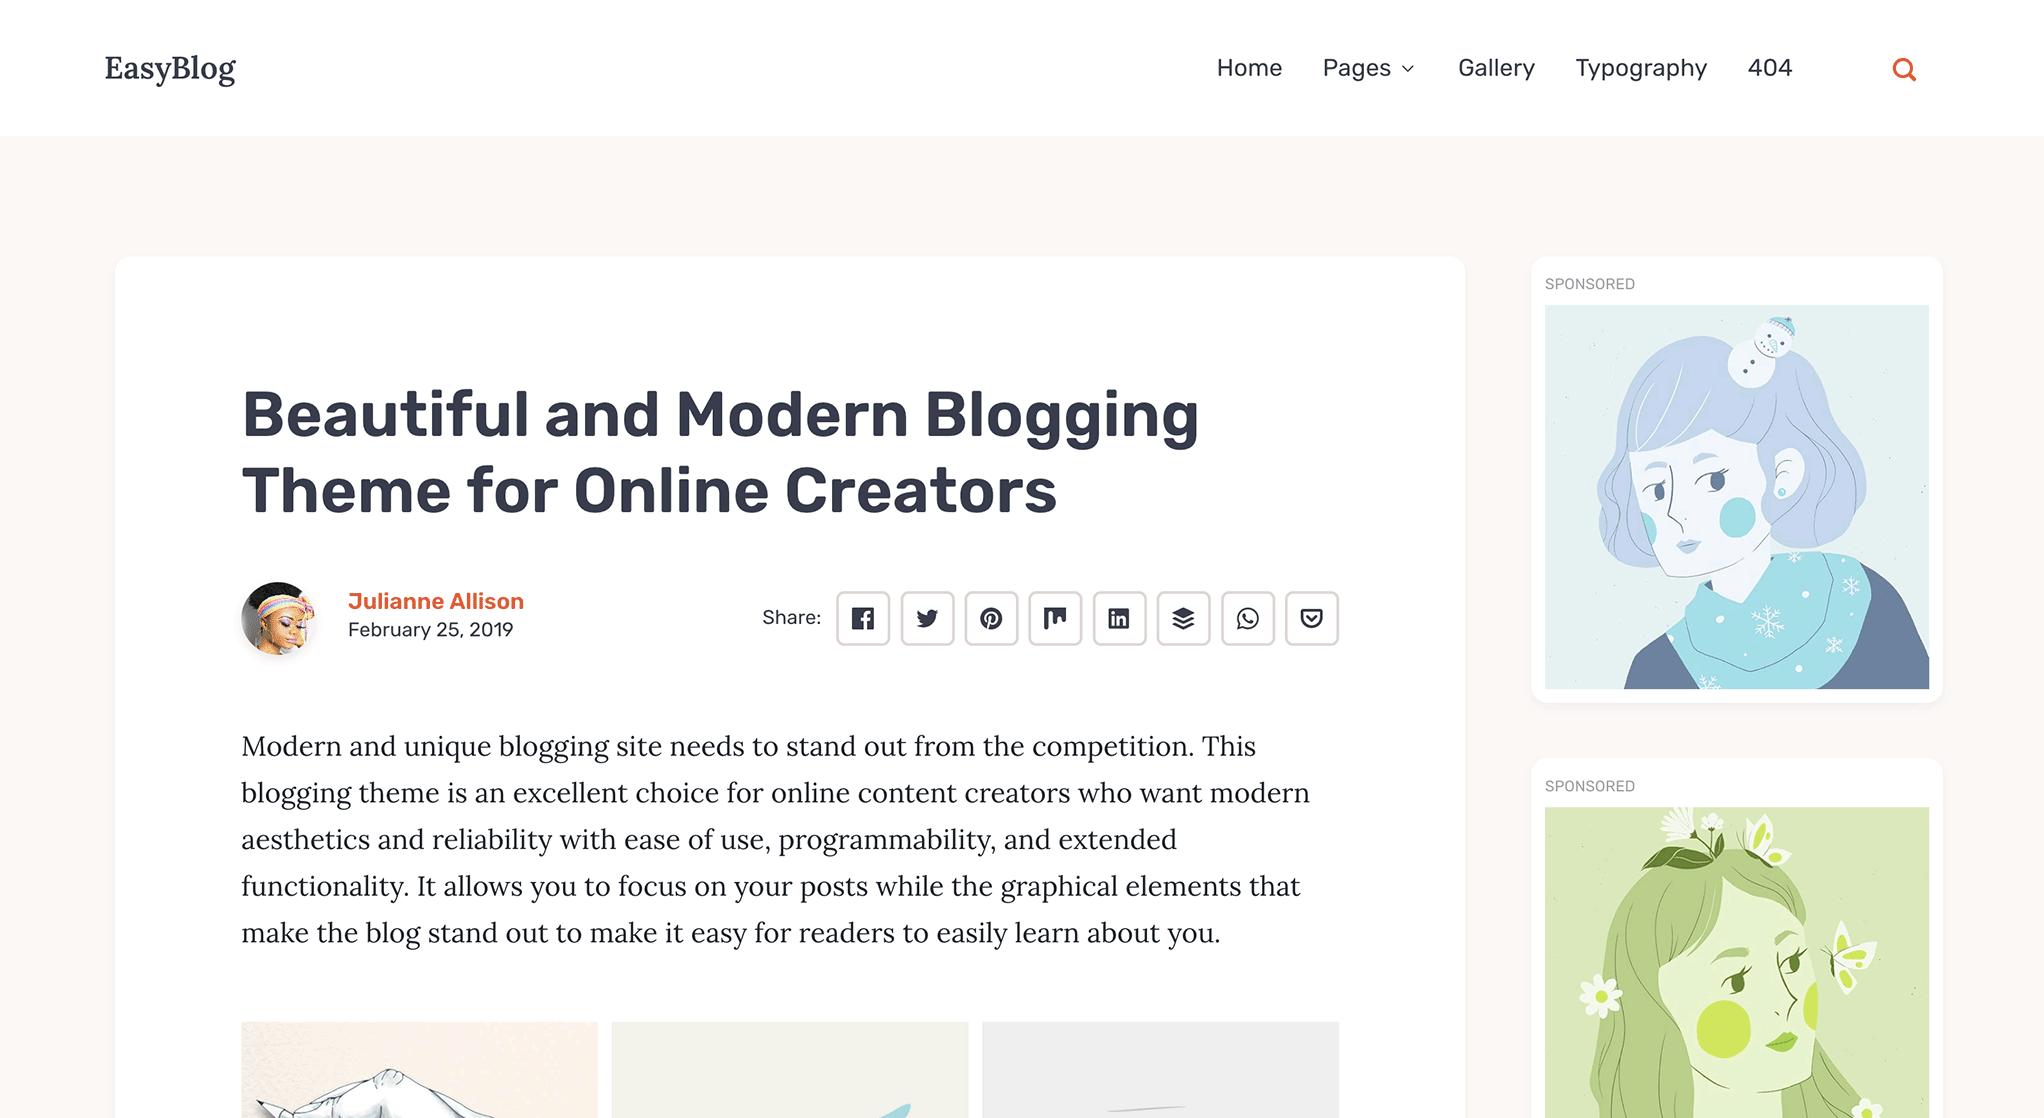 EasyBlog boxed post layout